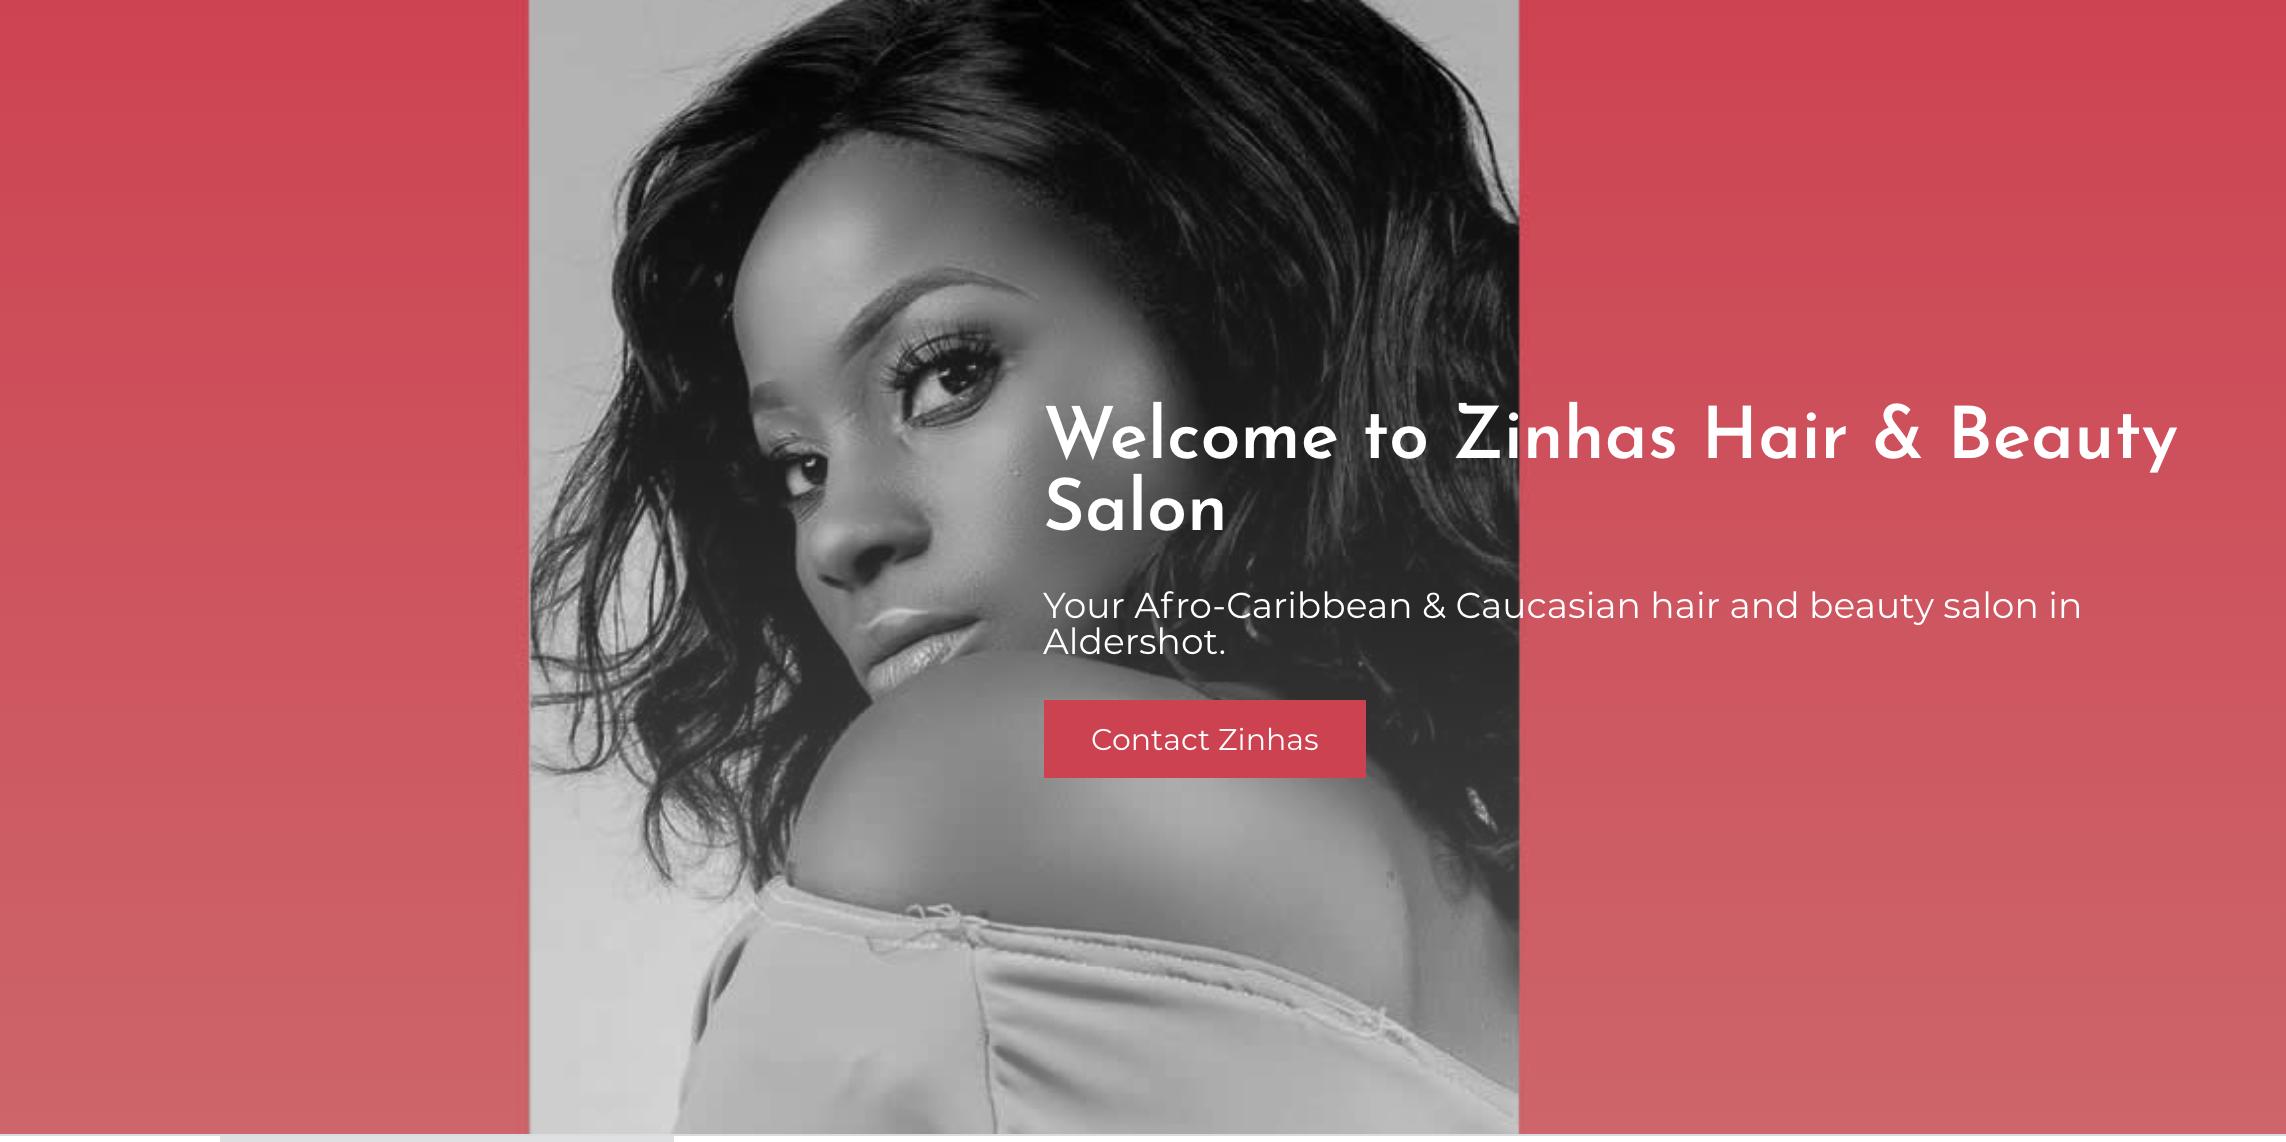 webwab-website-design-EC1-London-Zinhas-Hair-Salon